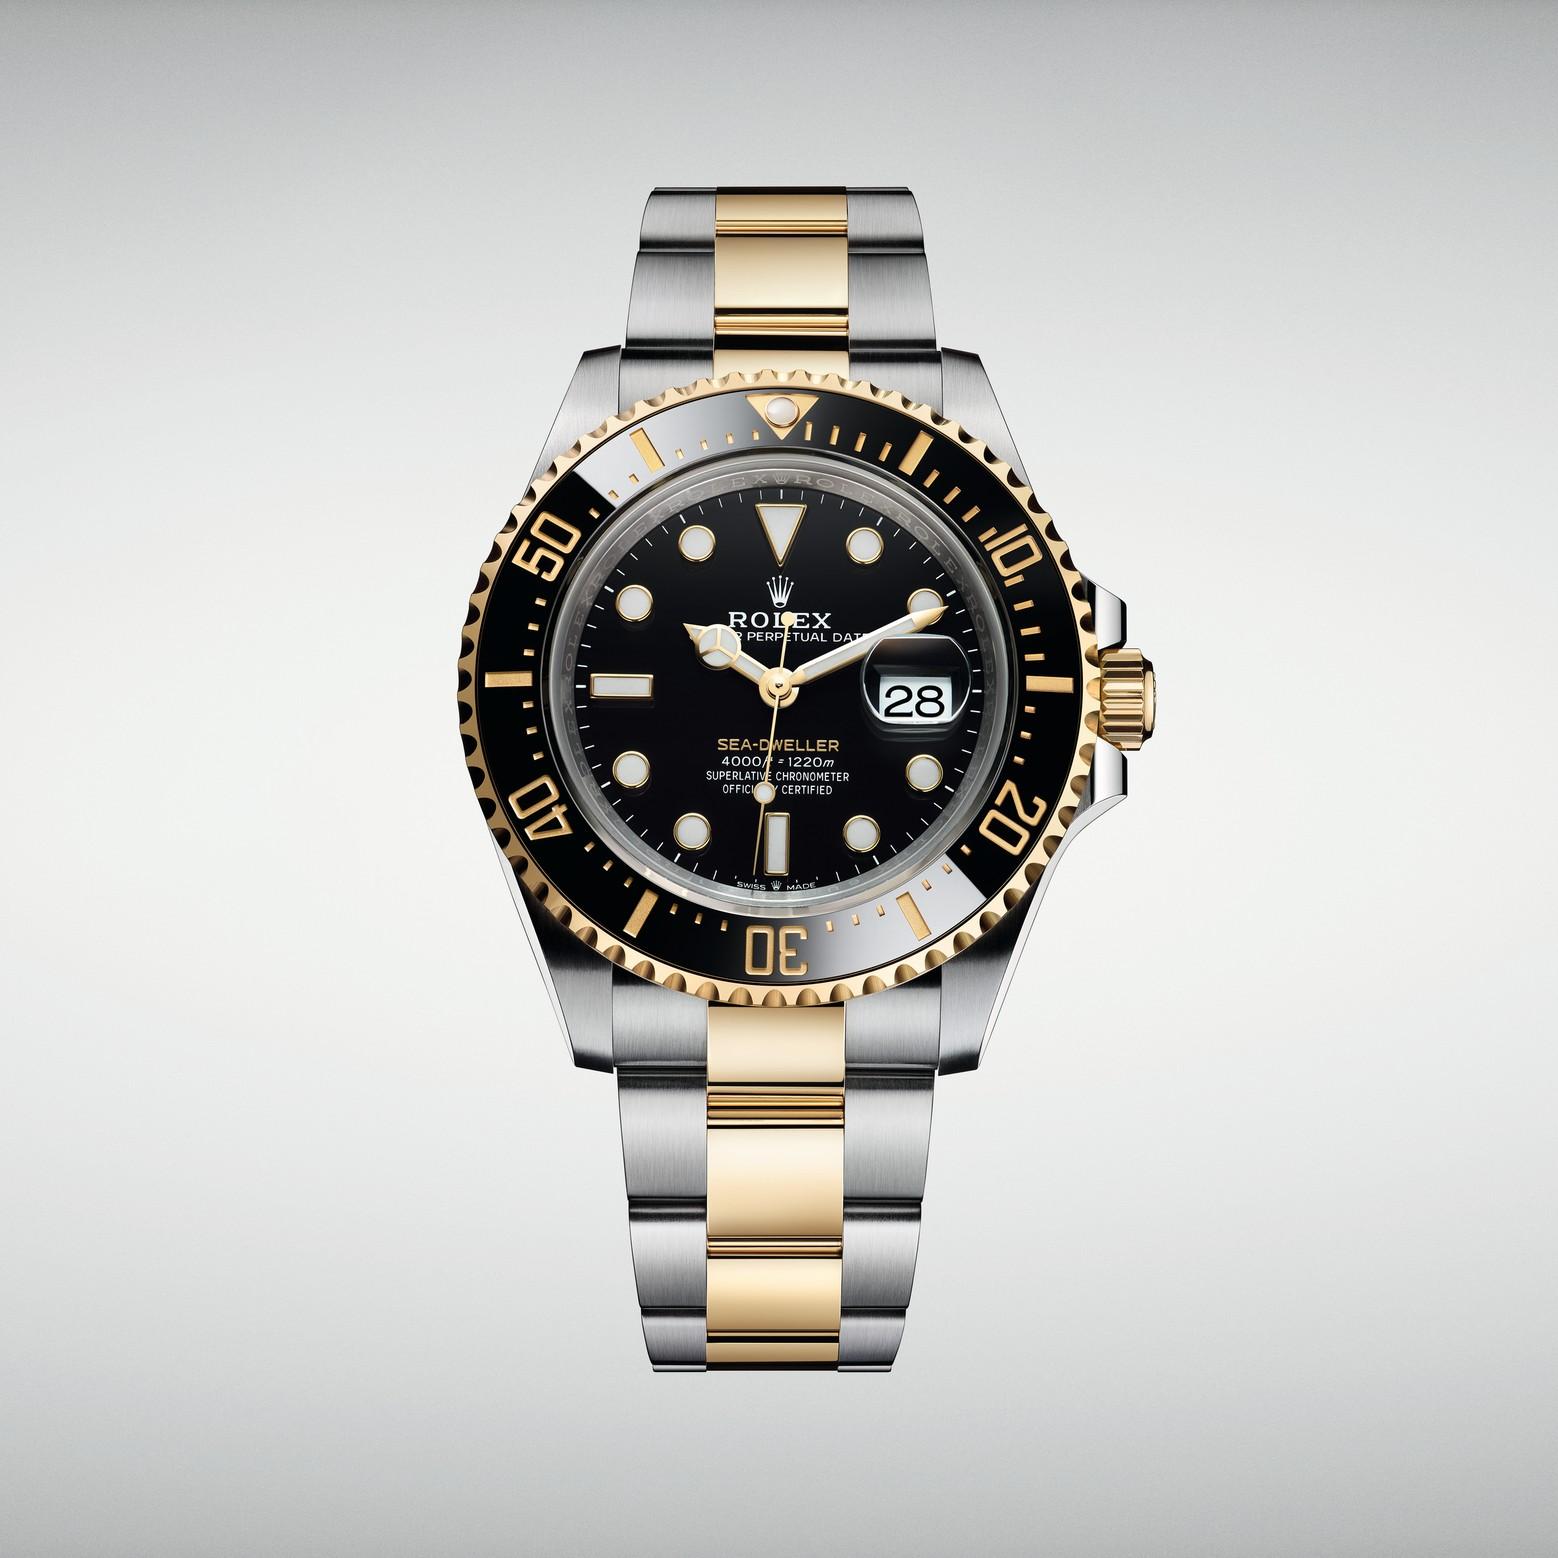 Rolex Sea-Dweller сталь-золото